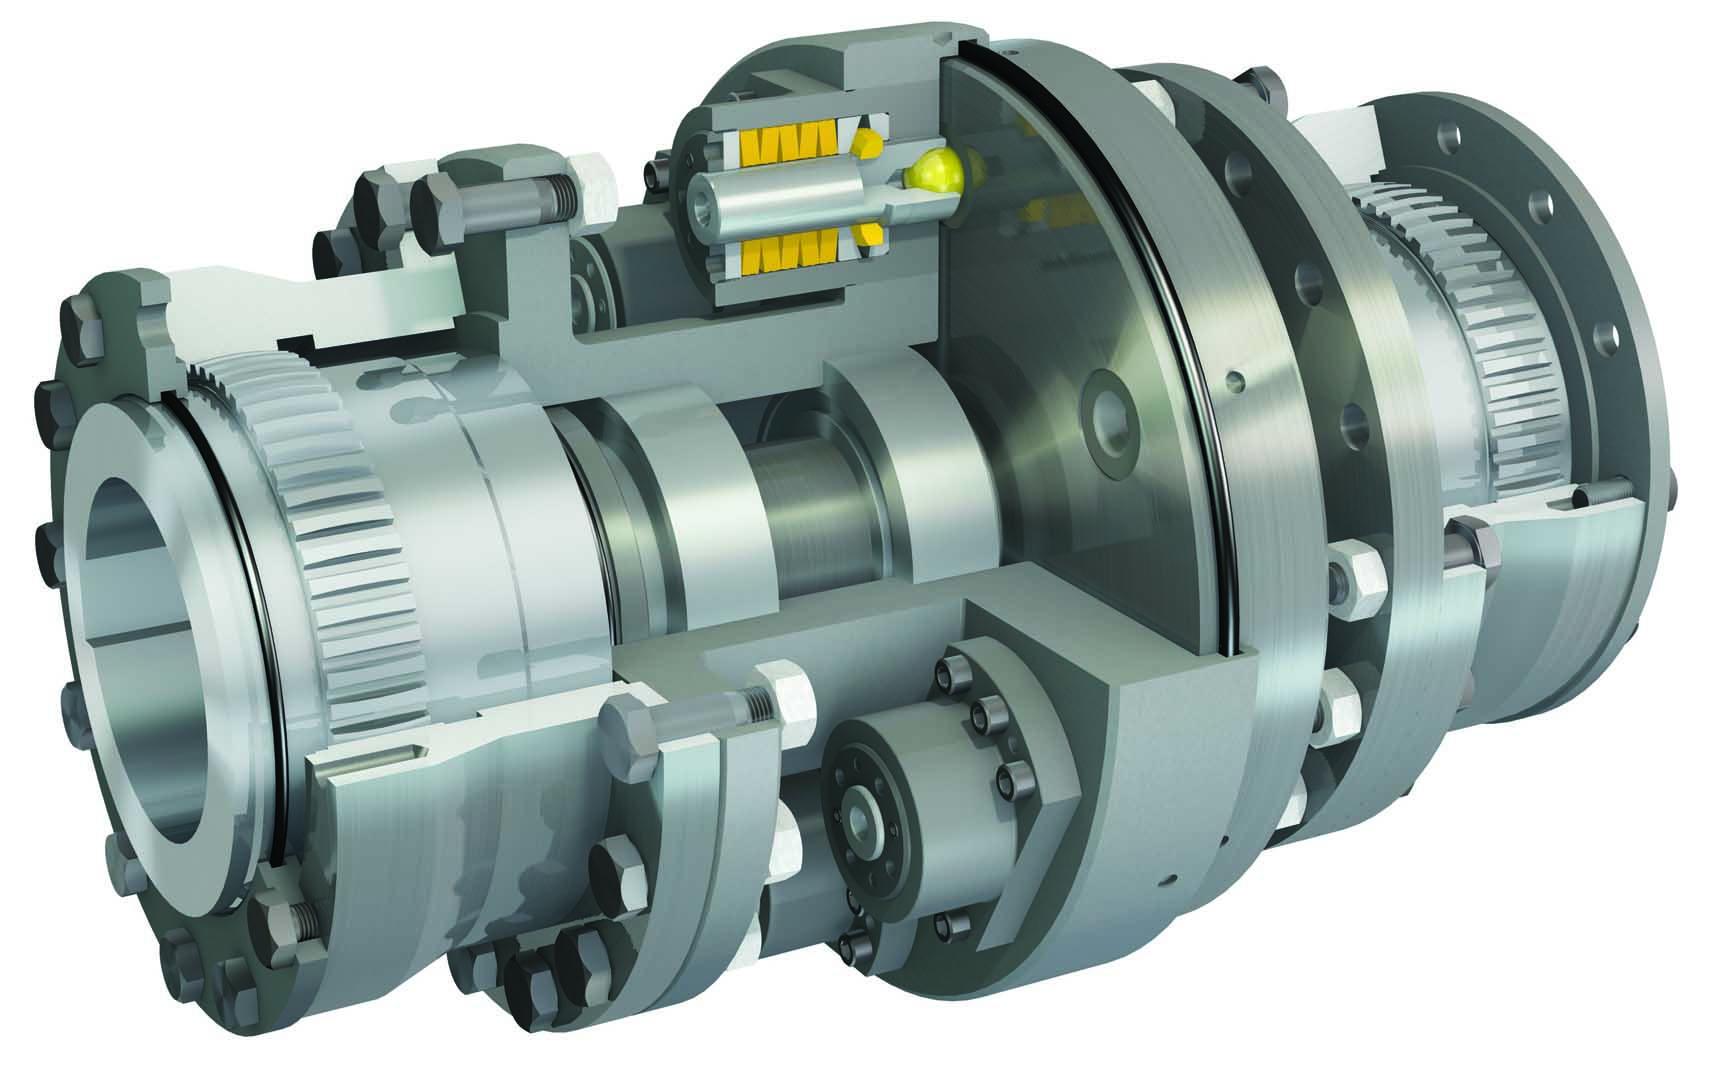 EAS®-HT torque limiters